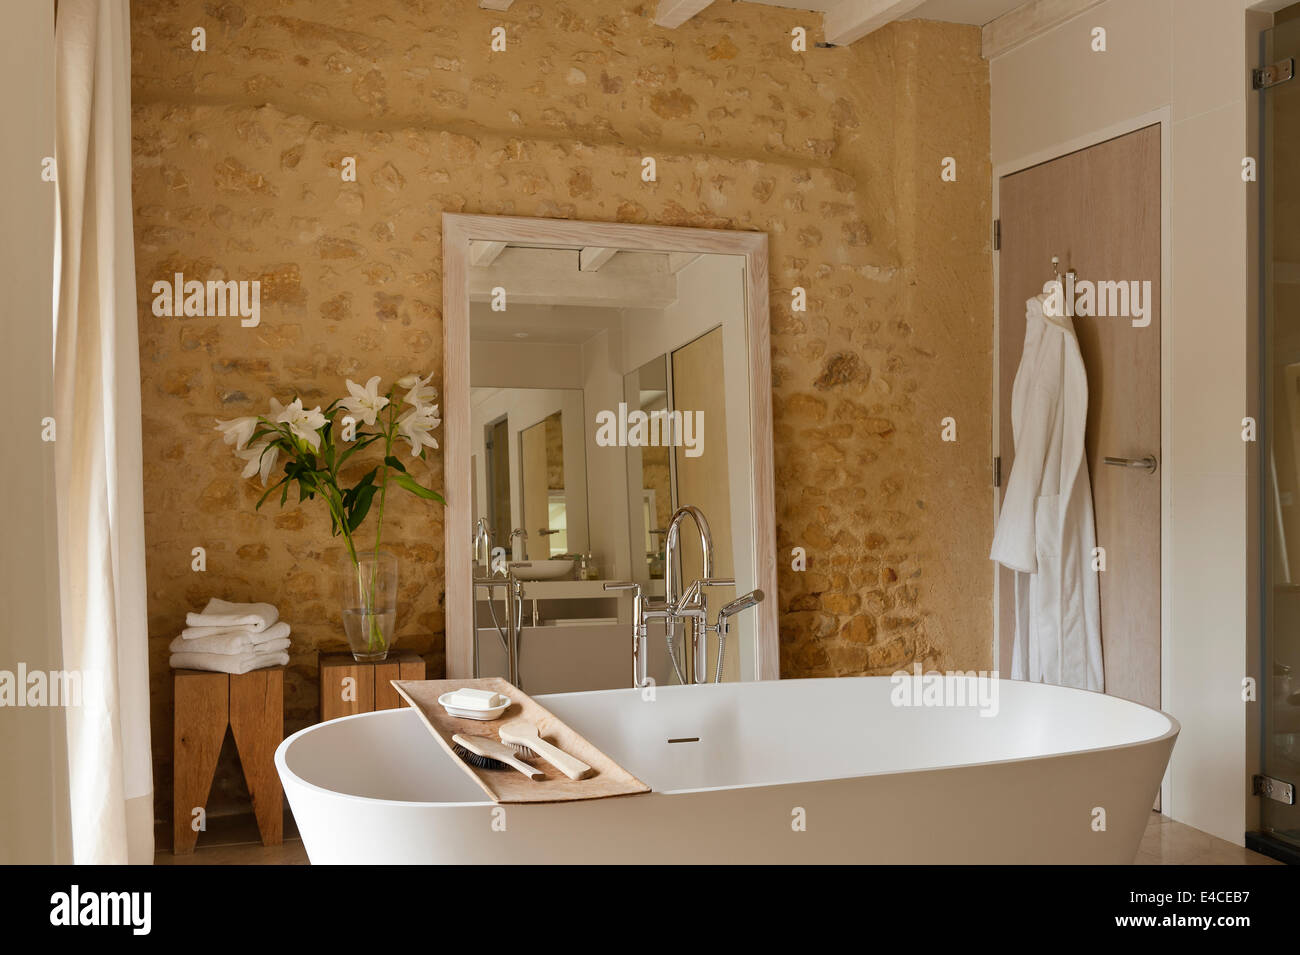 A Deep VAS 910 bath from Agape in bathroom with rough stone walls ...